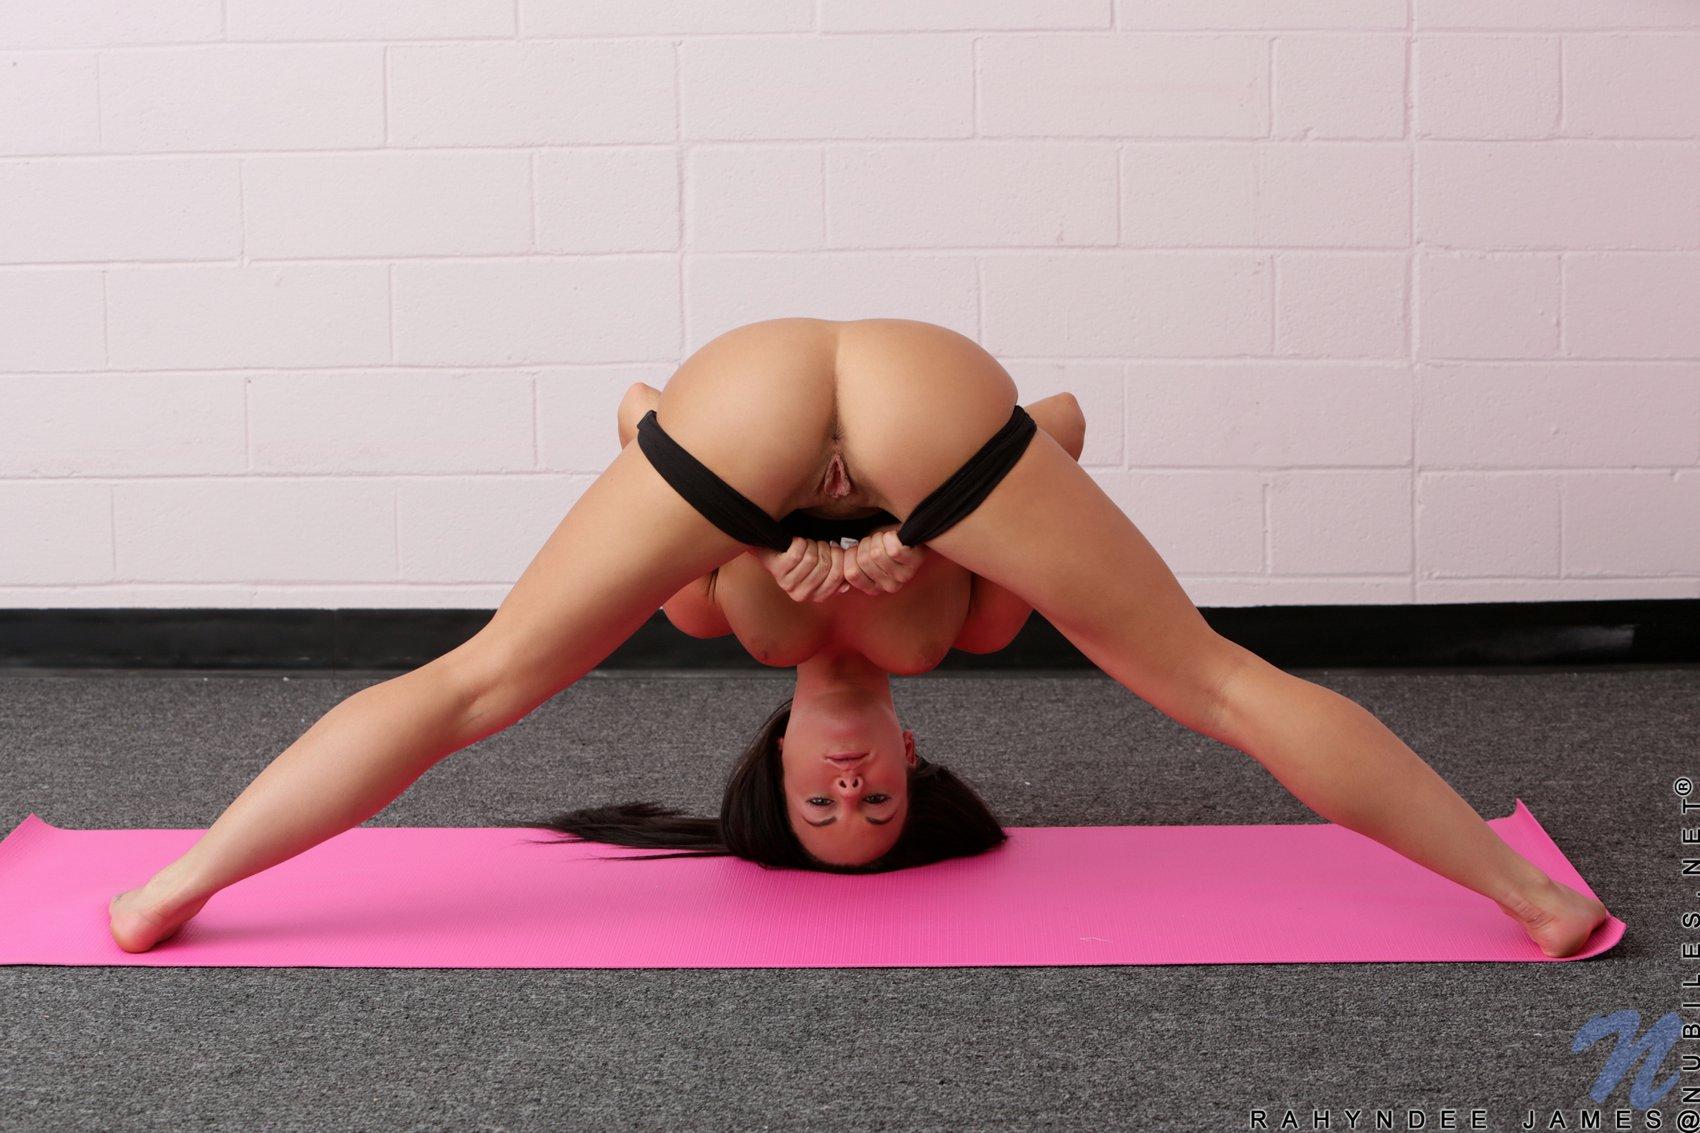 Hot yoga training with beautiful Rahyndee - My Pornstar Book